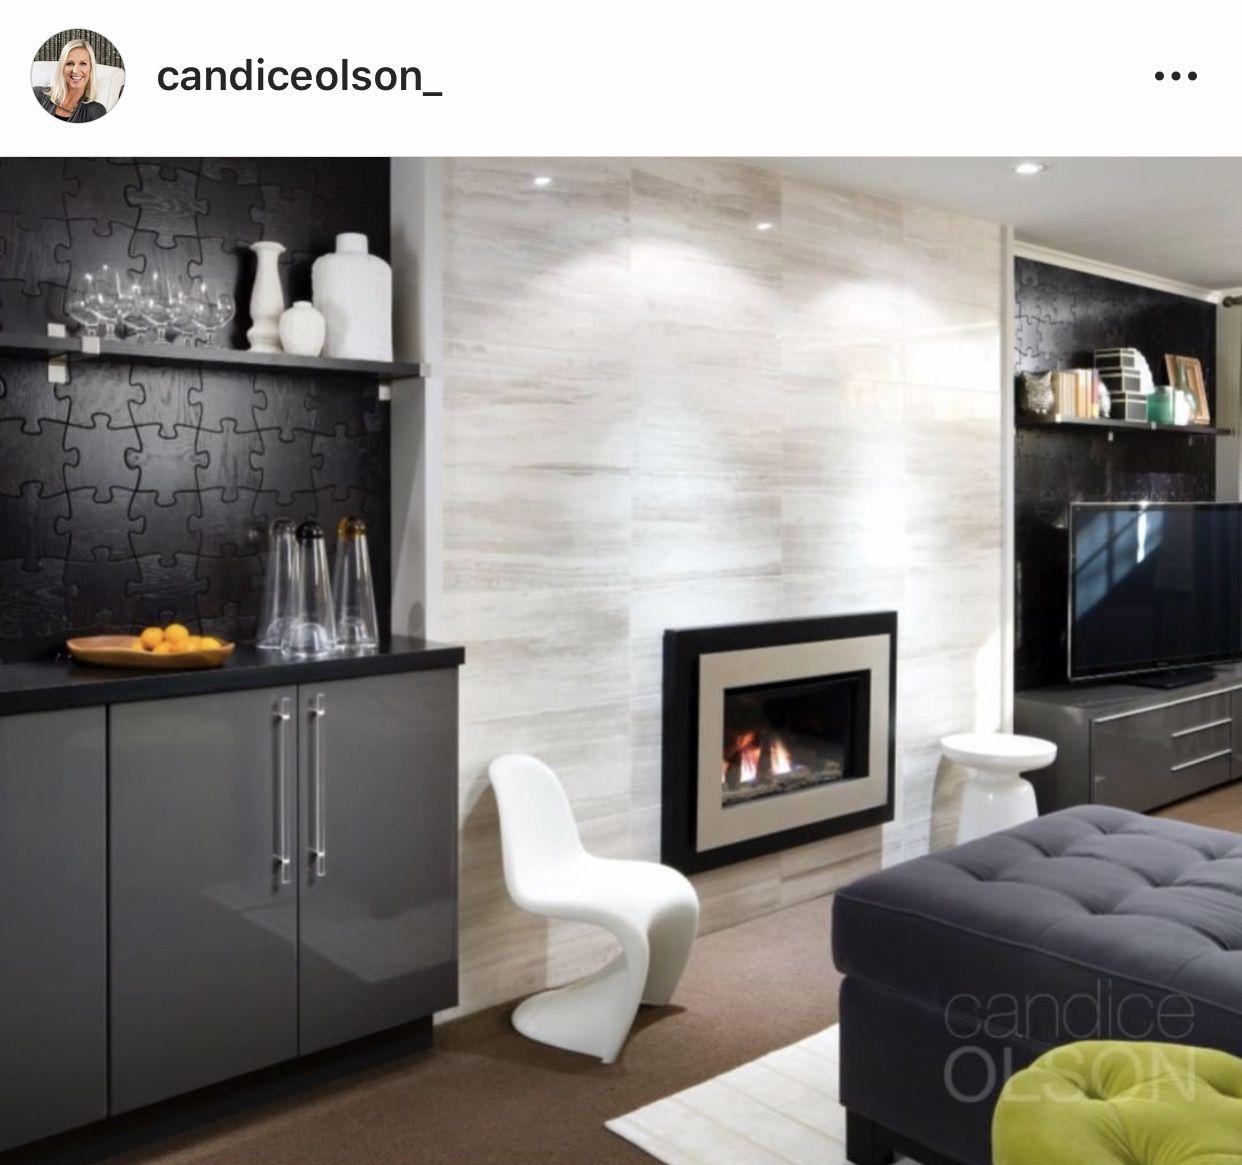 Candice Olson Basement Design: Pin By Lenya Wilson On Candice Olson Basements In 2020